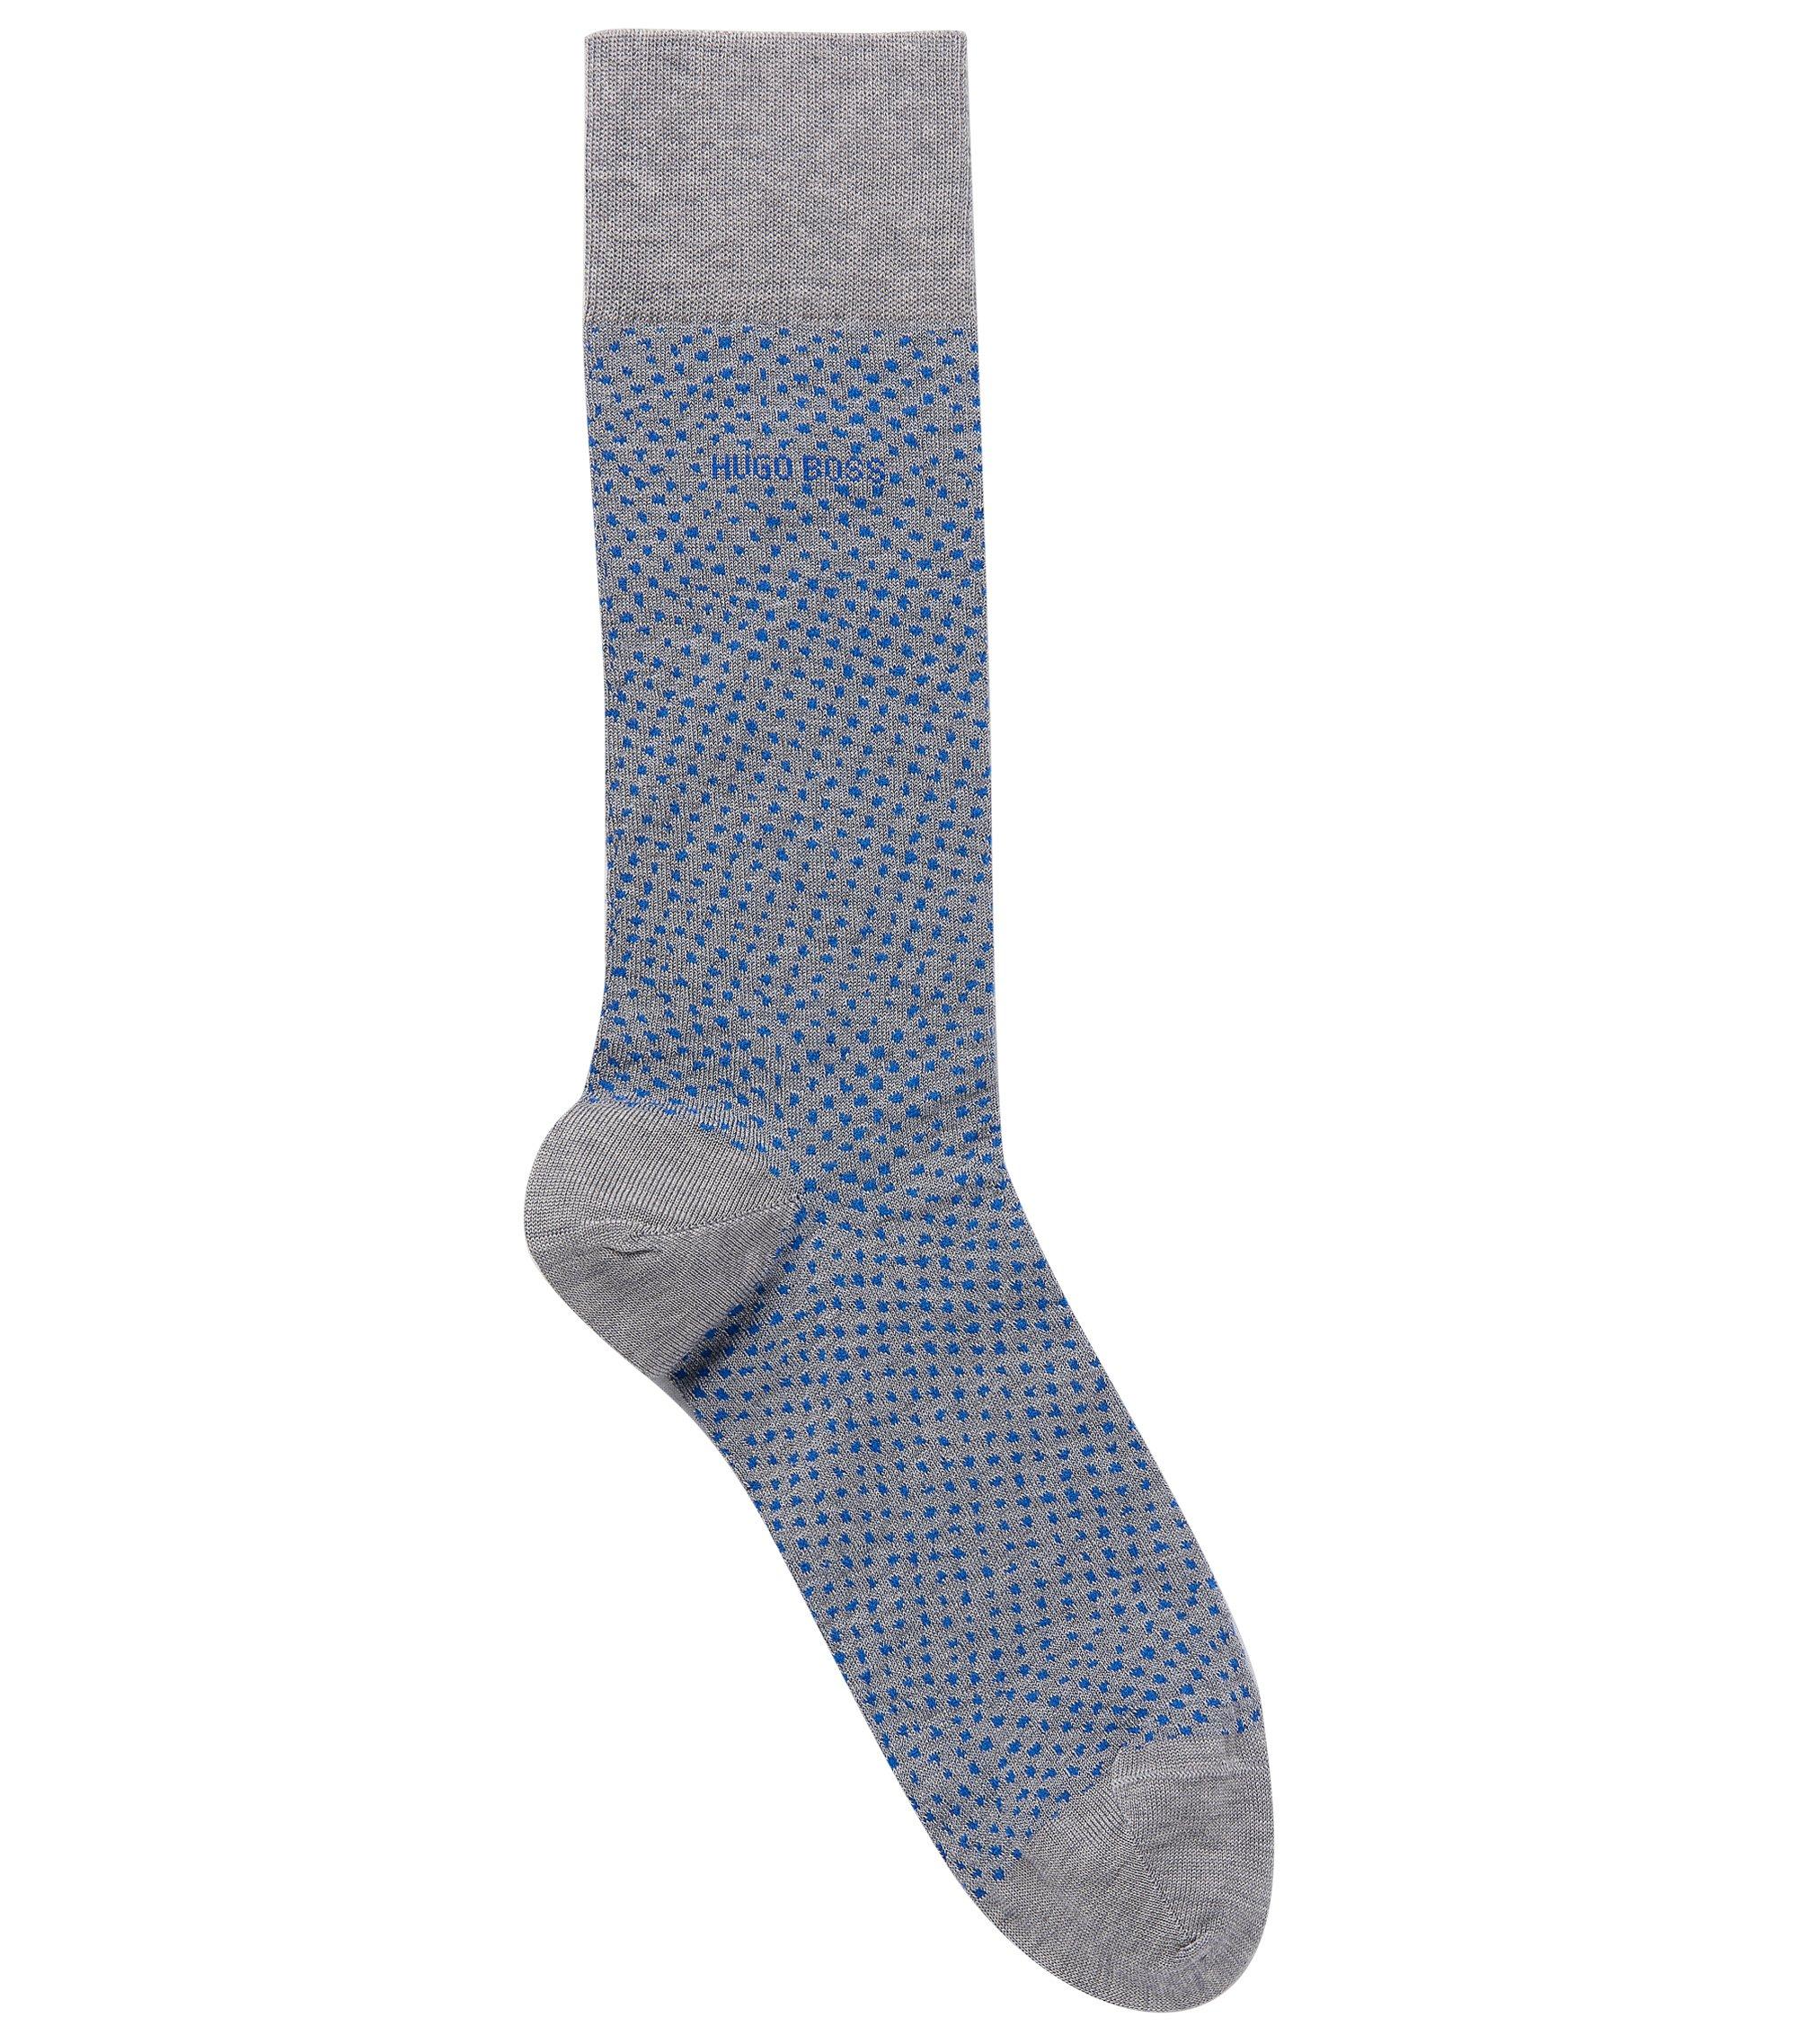 Stretch Cotton Blend Sock   RS Design US, Silver